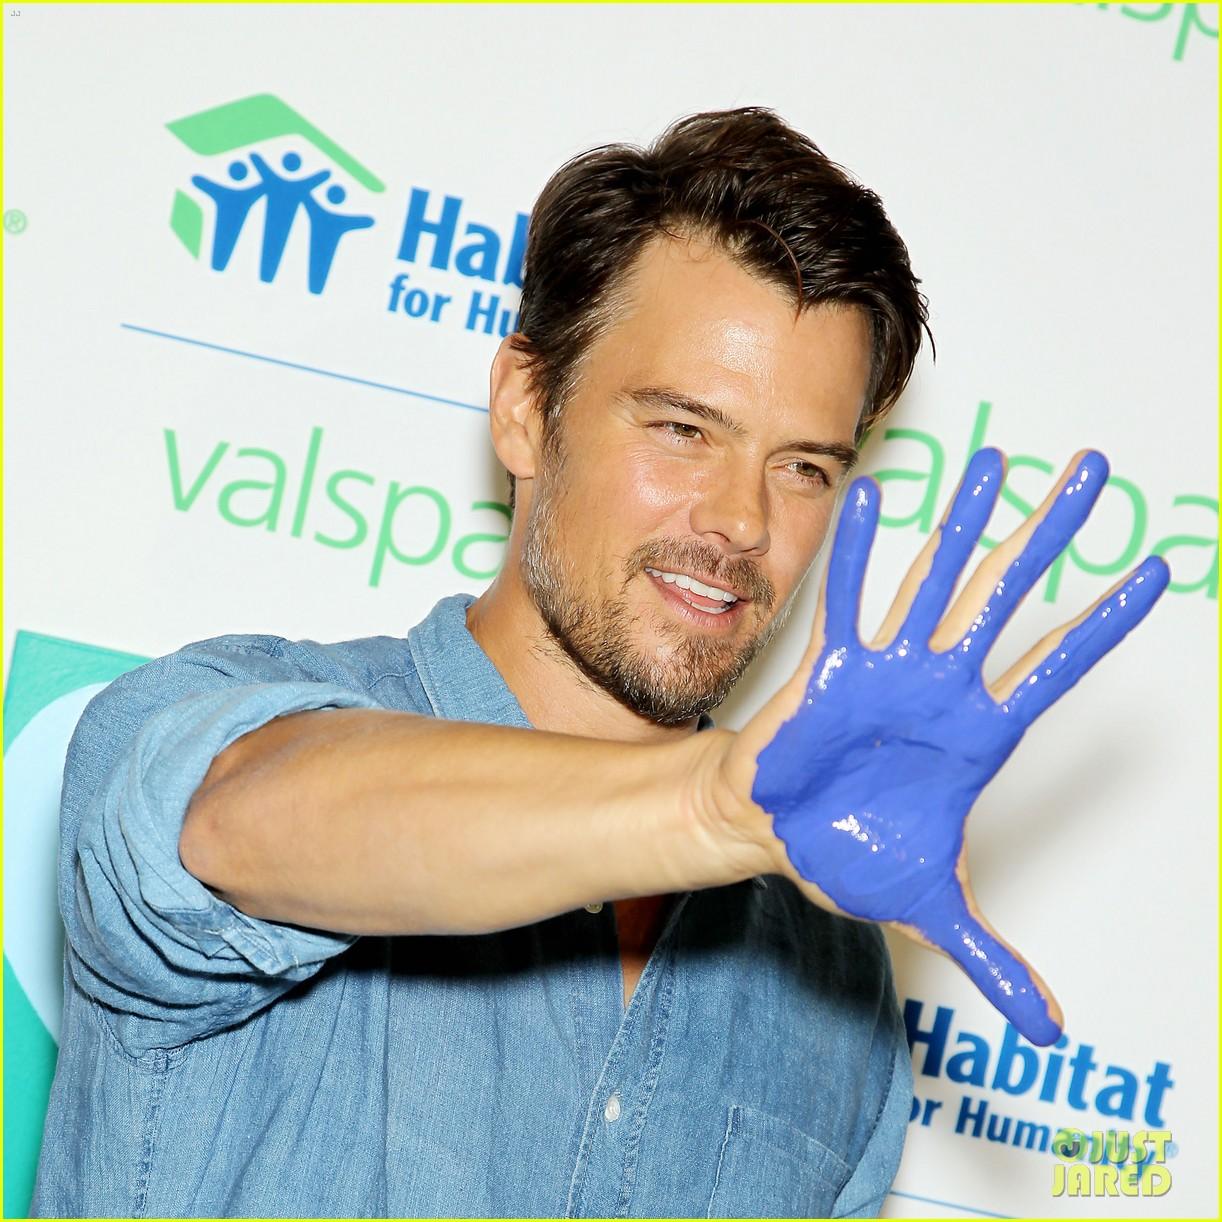 josh duhamel lends a helping hand at valspar charity event 01